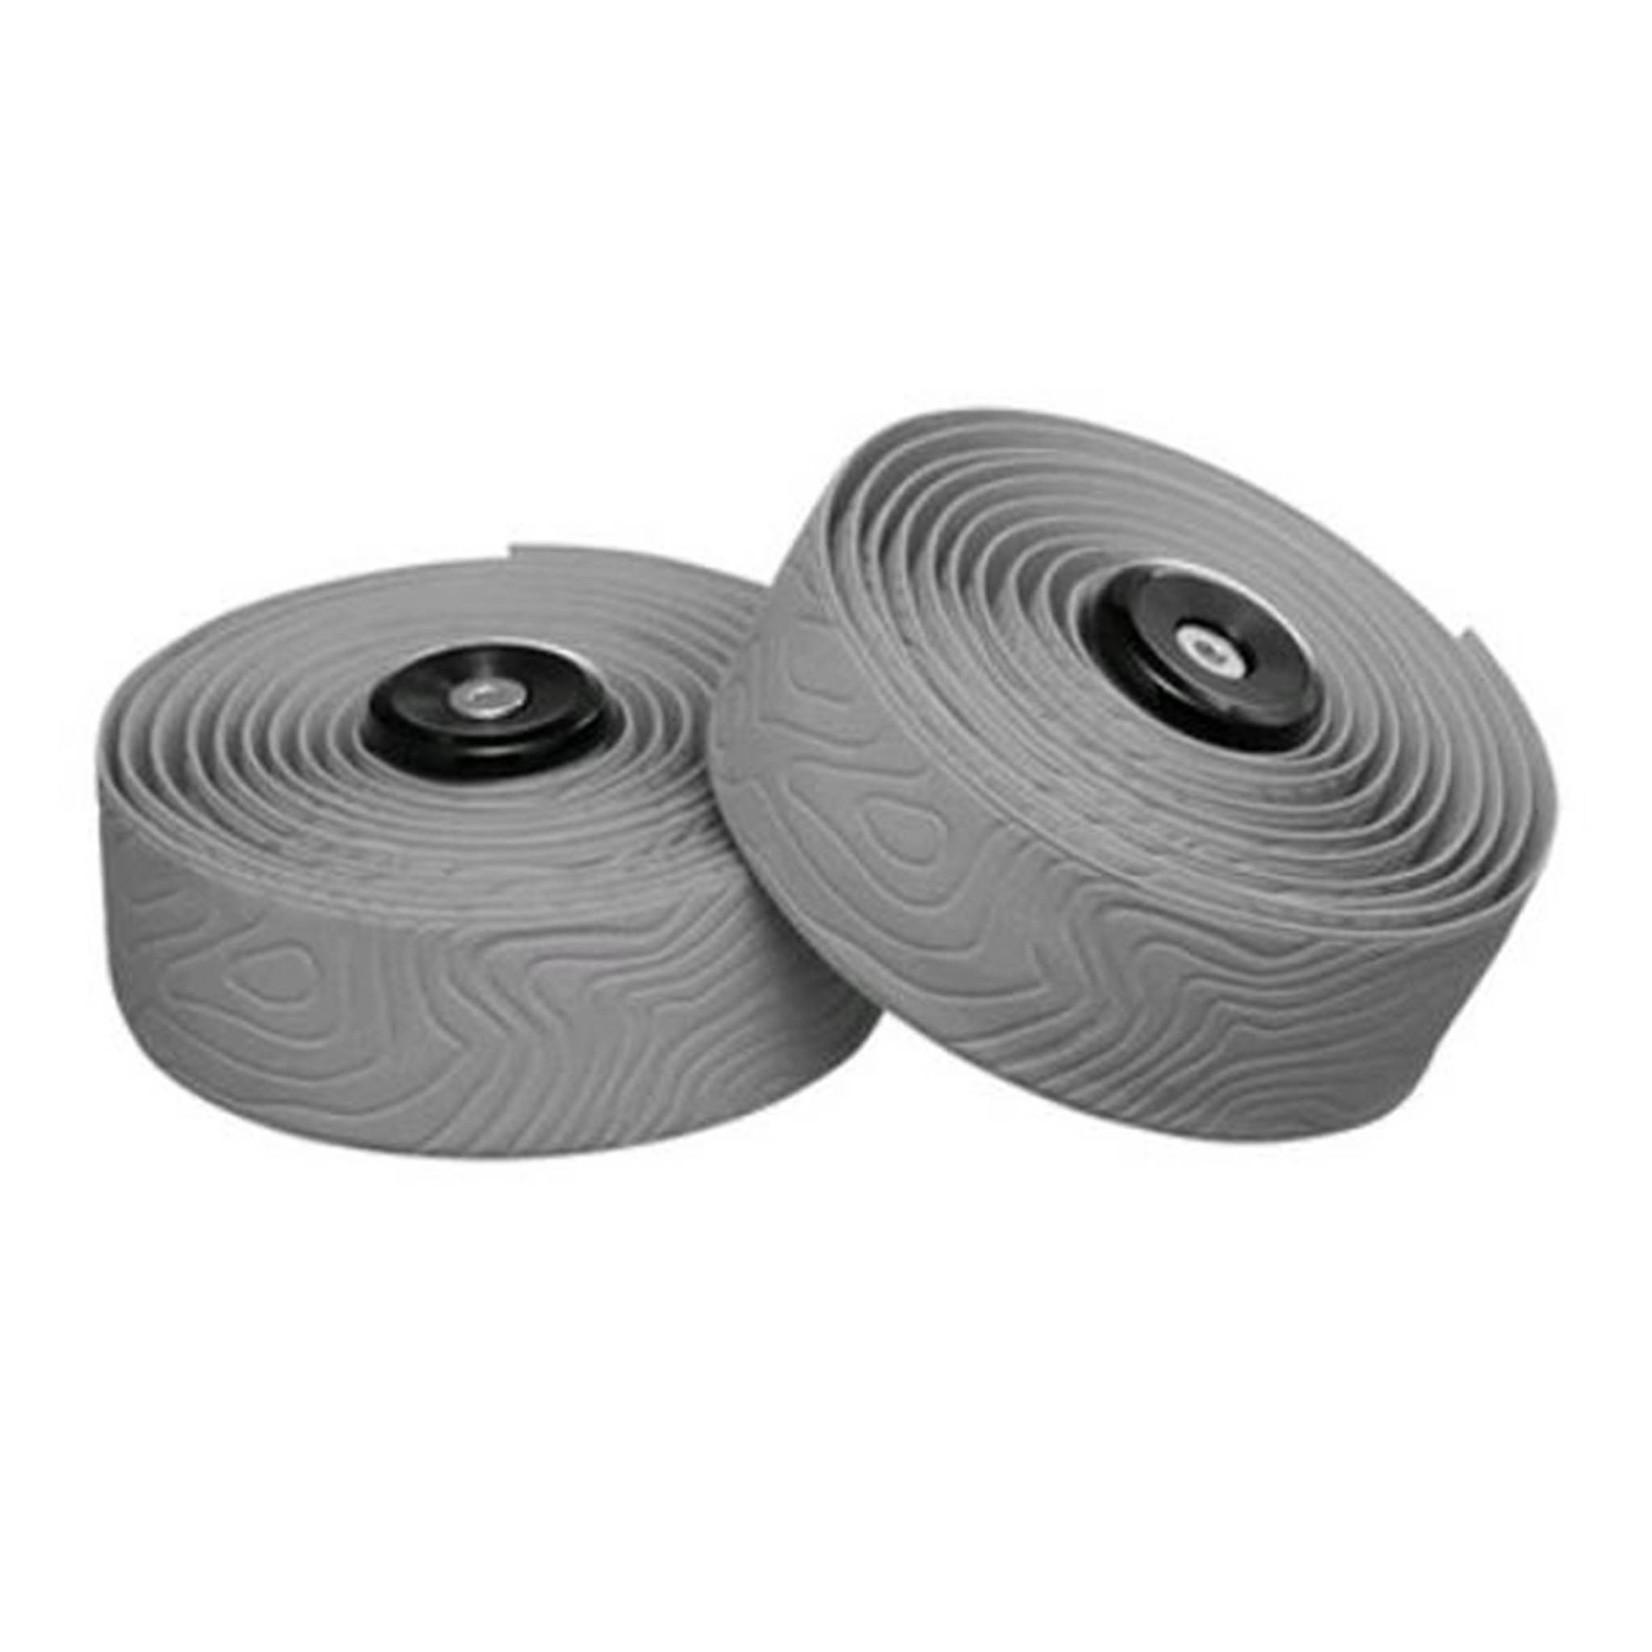 Guee Sio Duro Silicon Bar Tape Grey